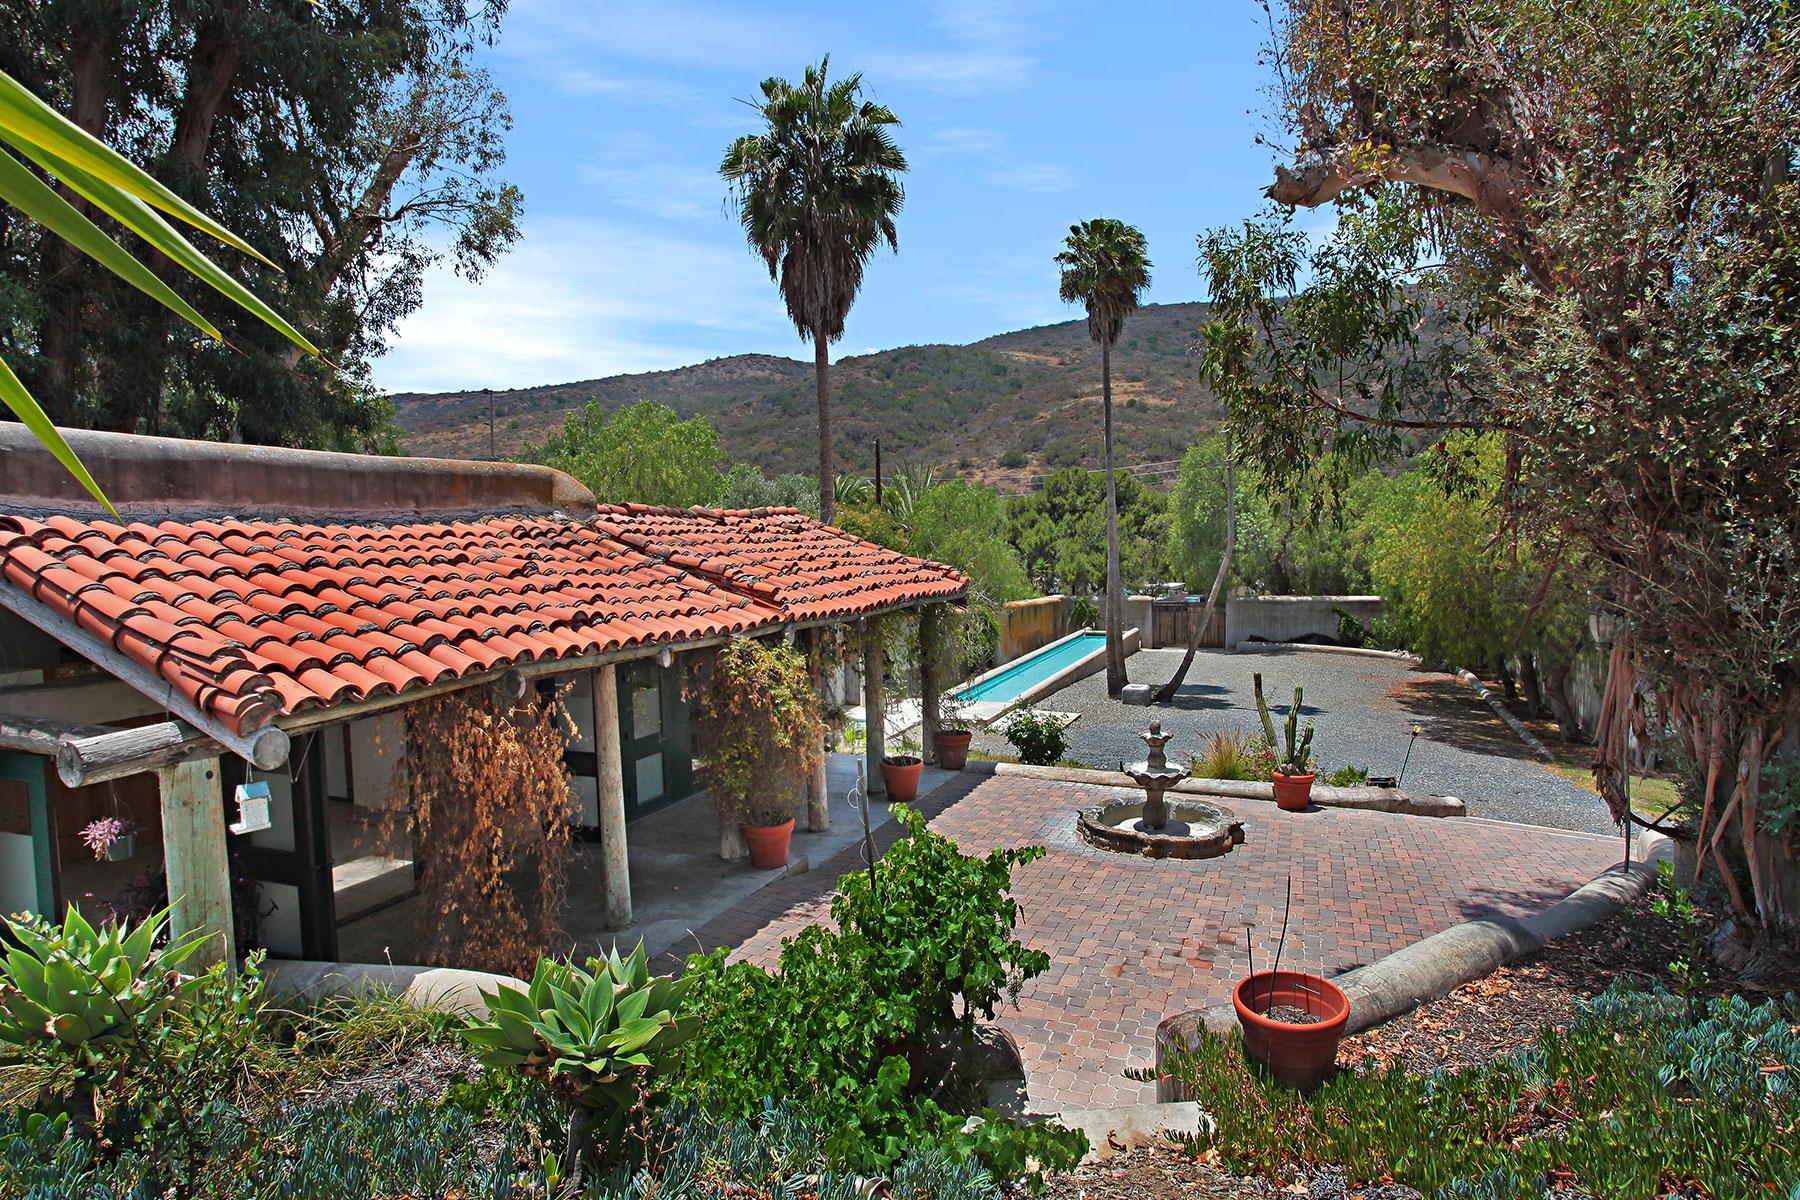 Single Family Home for Sale at 20482 Sun Valley Laguna Beach, California, 92651 United States